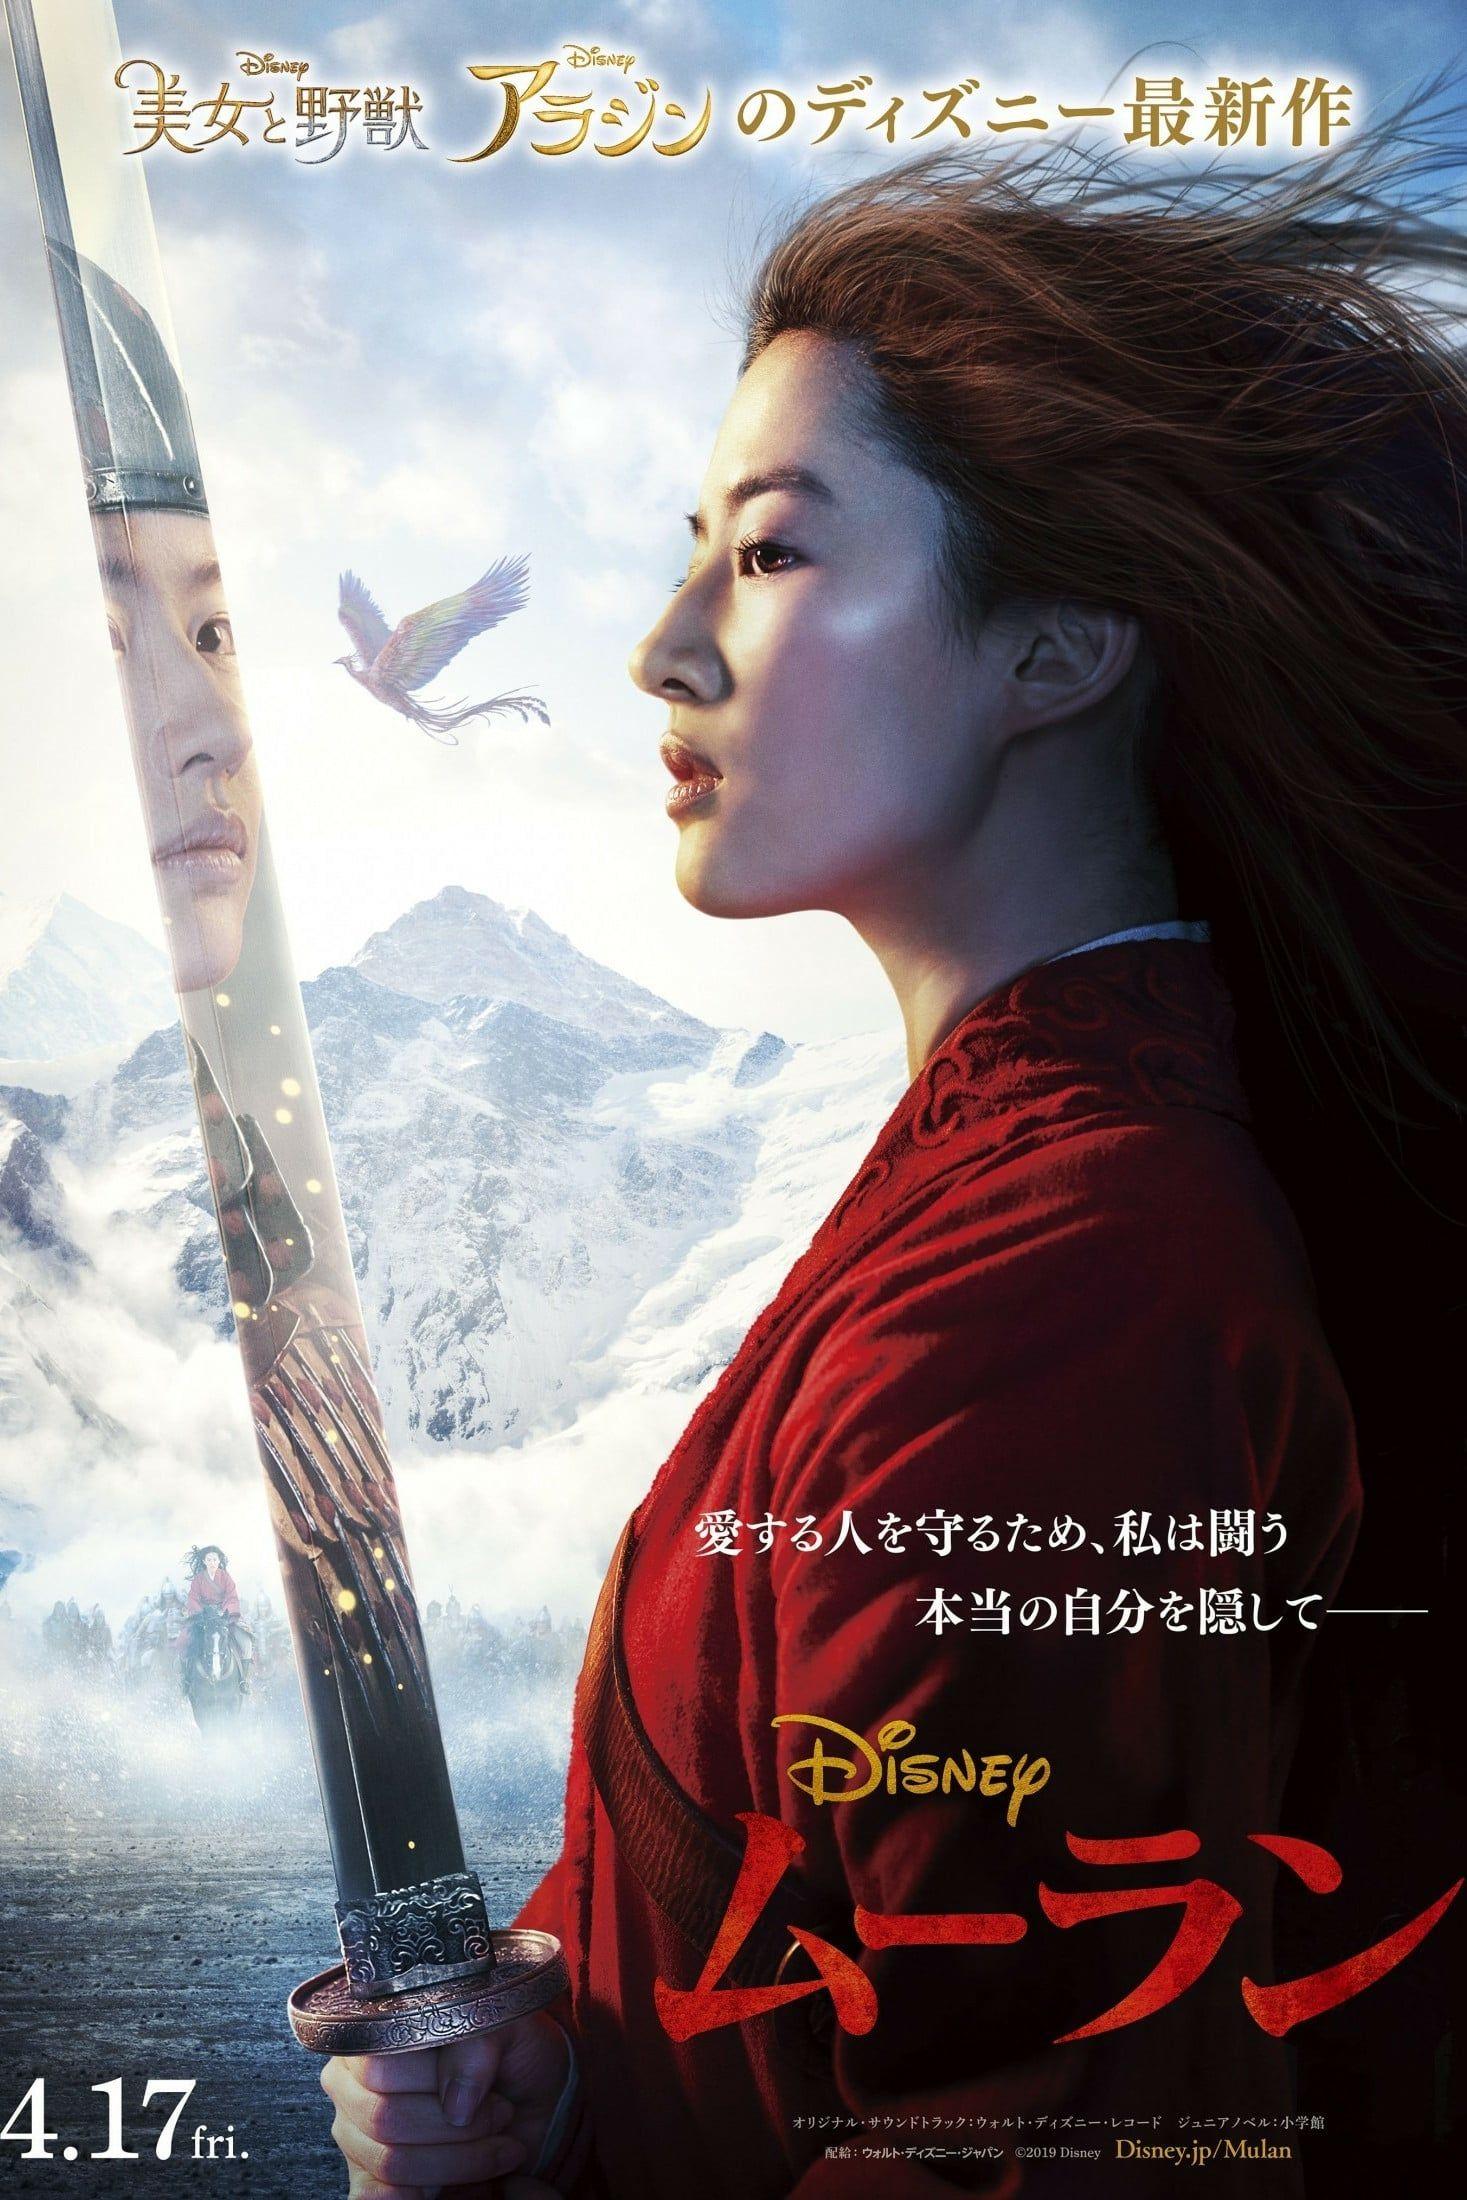 Gebruik De Onderstaande Links Om Hoe Tem Je Een Draak 3 Belgie Versie Volledige Film Online Stream Te Bekijken Mulan Movie New Movie Posters Watch Mulan